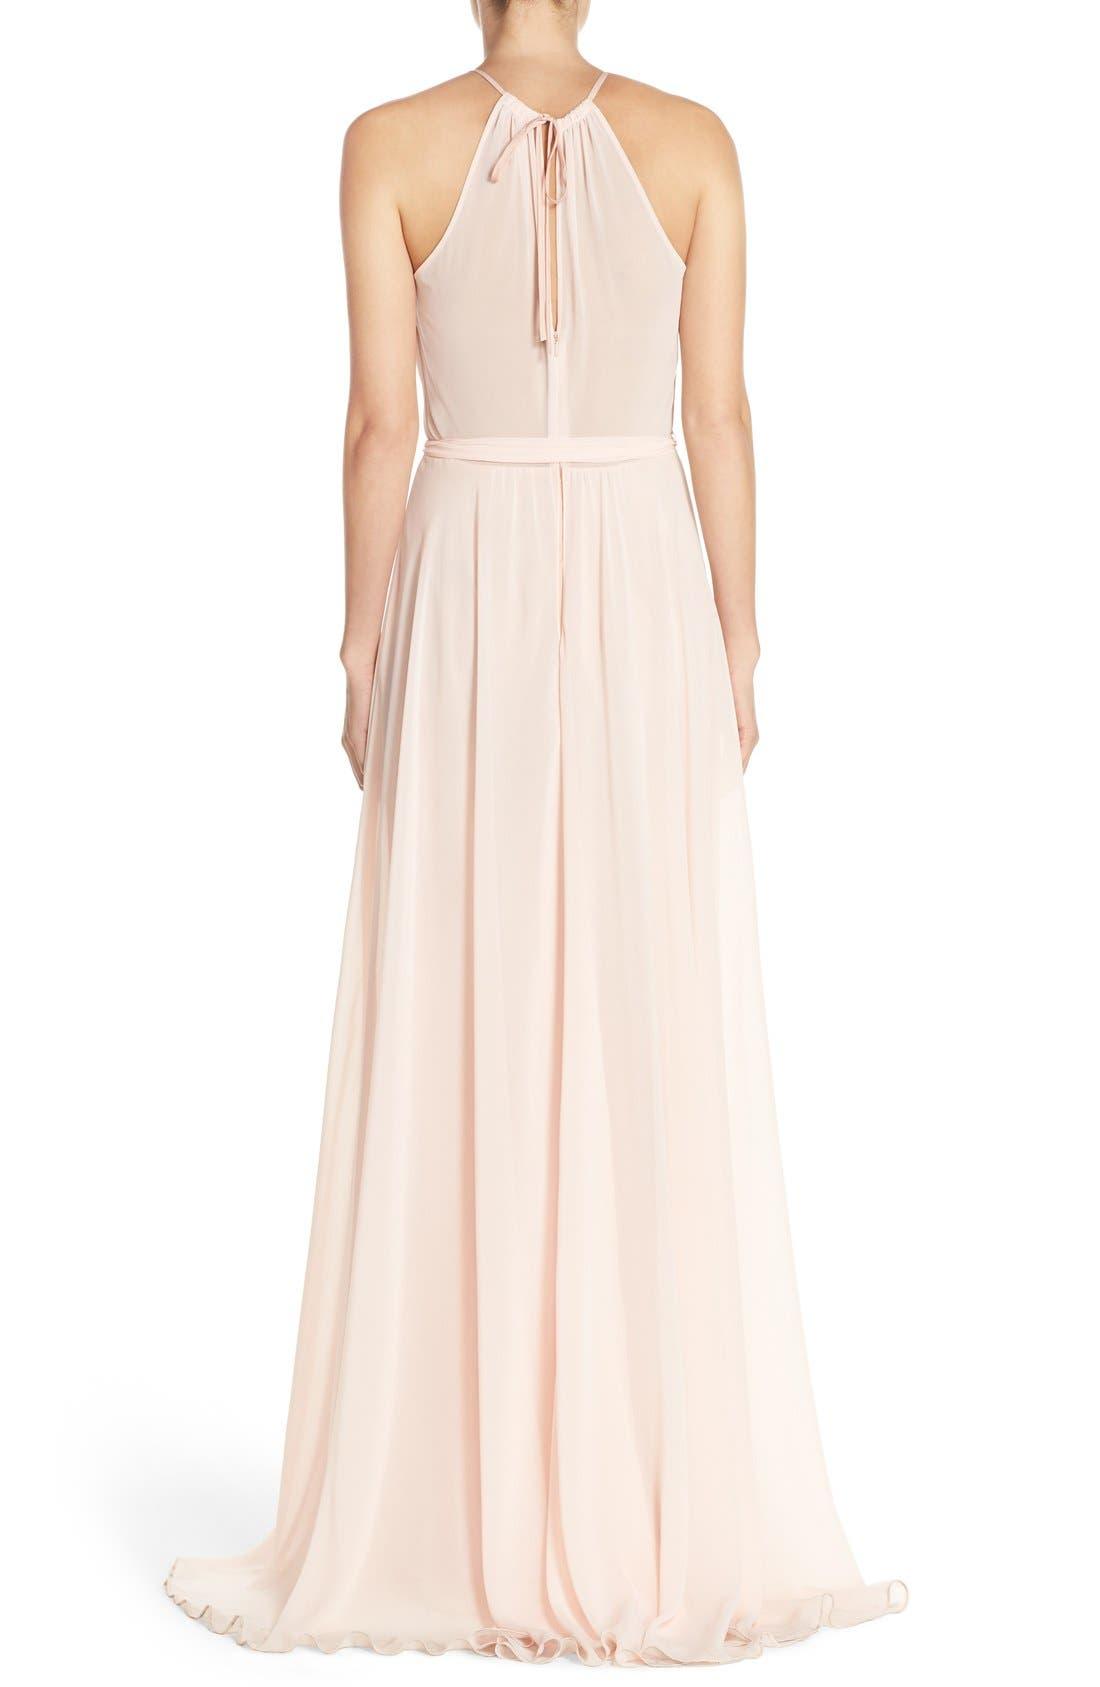 'Delaney' Belted A-Line Chiffon Halter Dress,                             Alternate thumbnail 6, color,